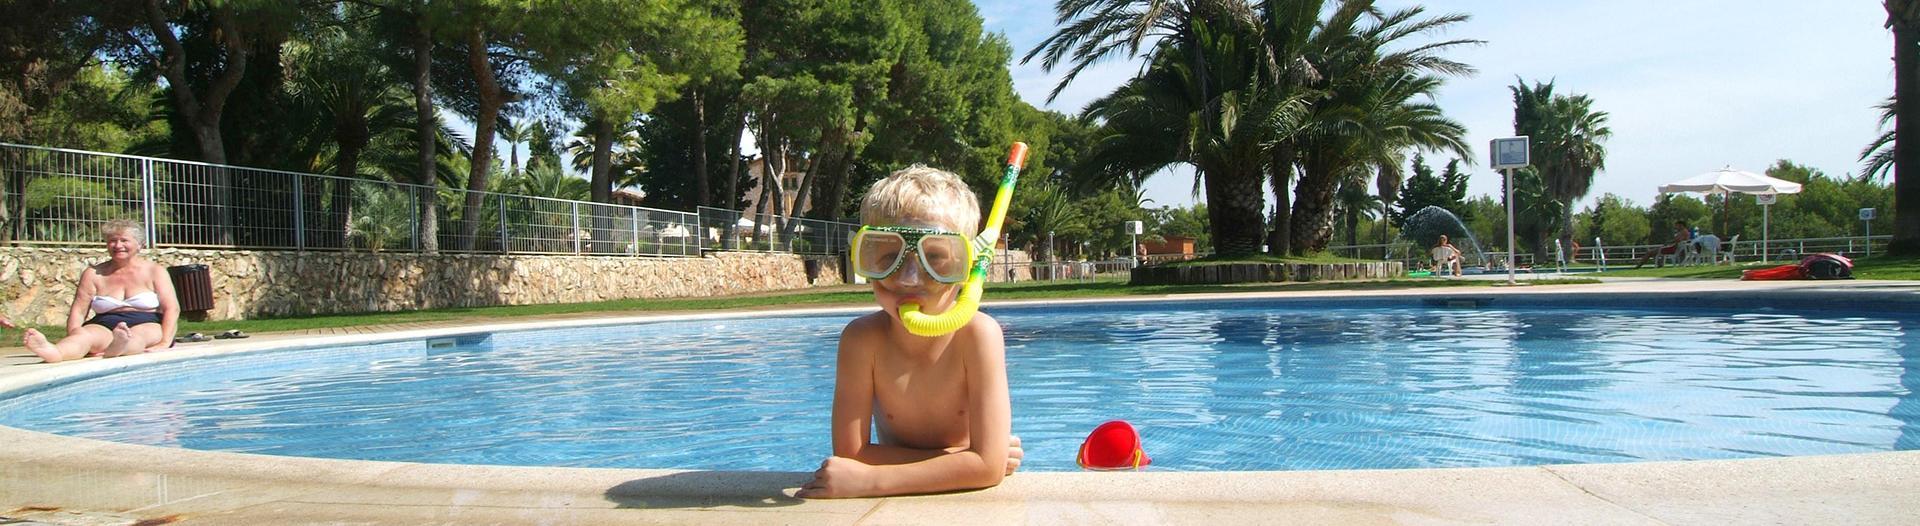 slider-camping-vilanova-park-costa-dorada-piscine